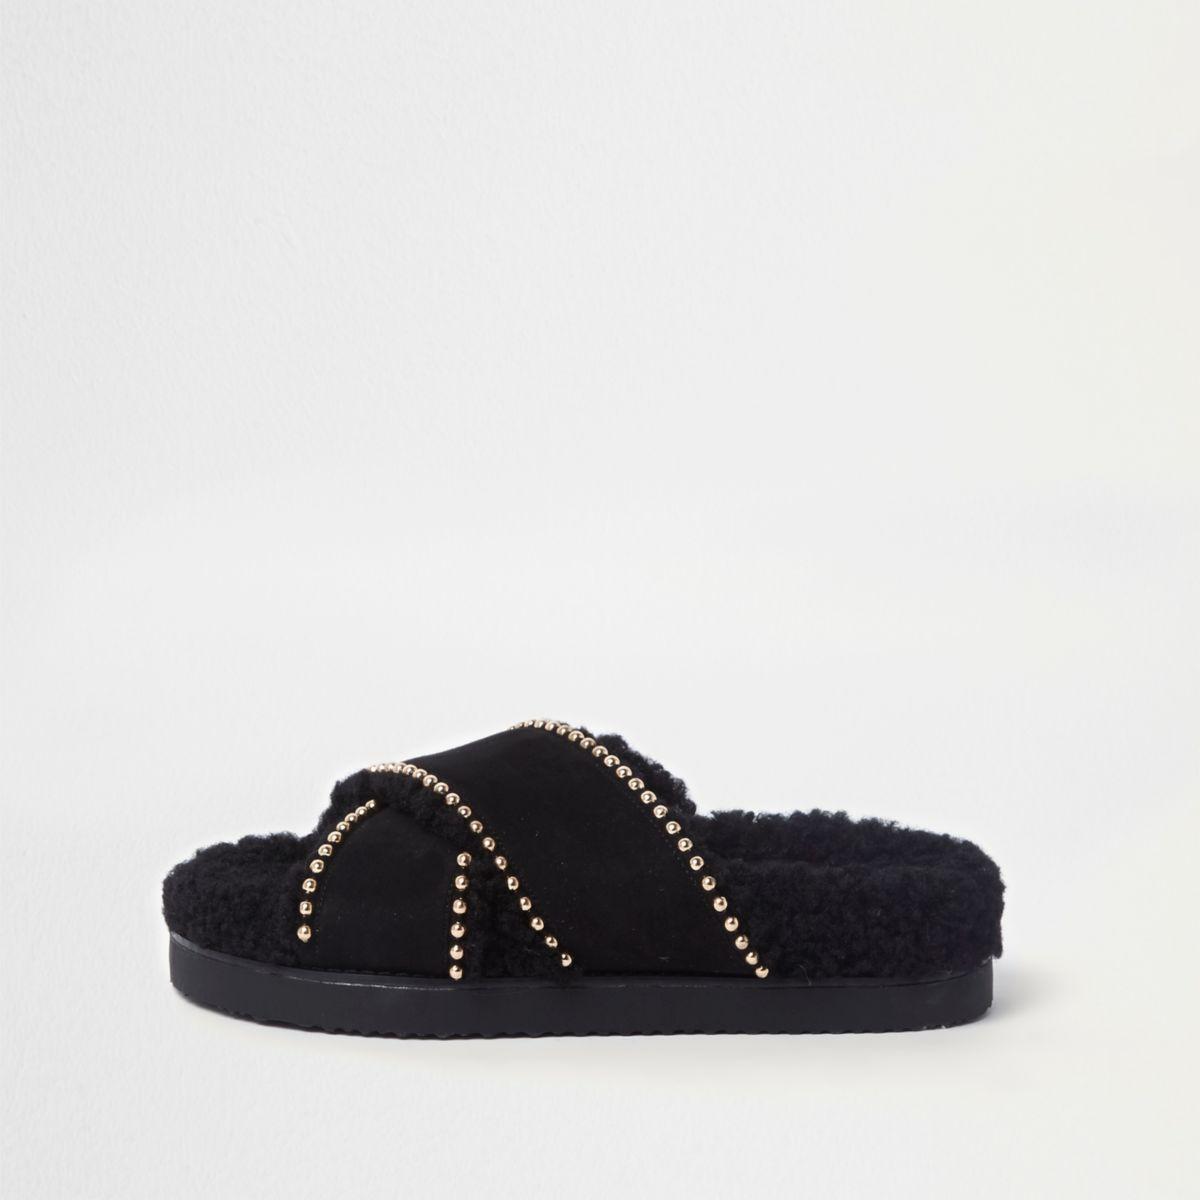 Black shearling footbed studded sliders